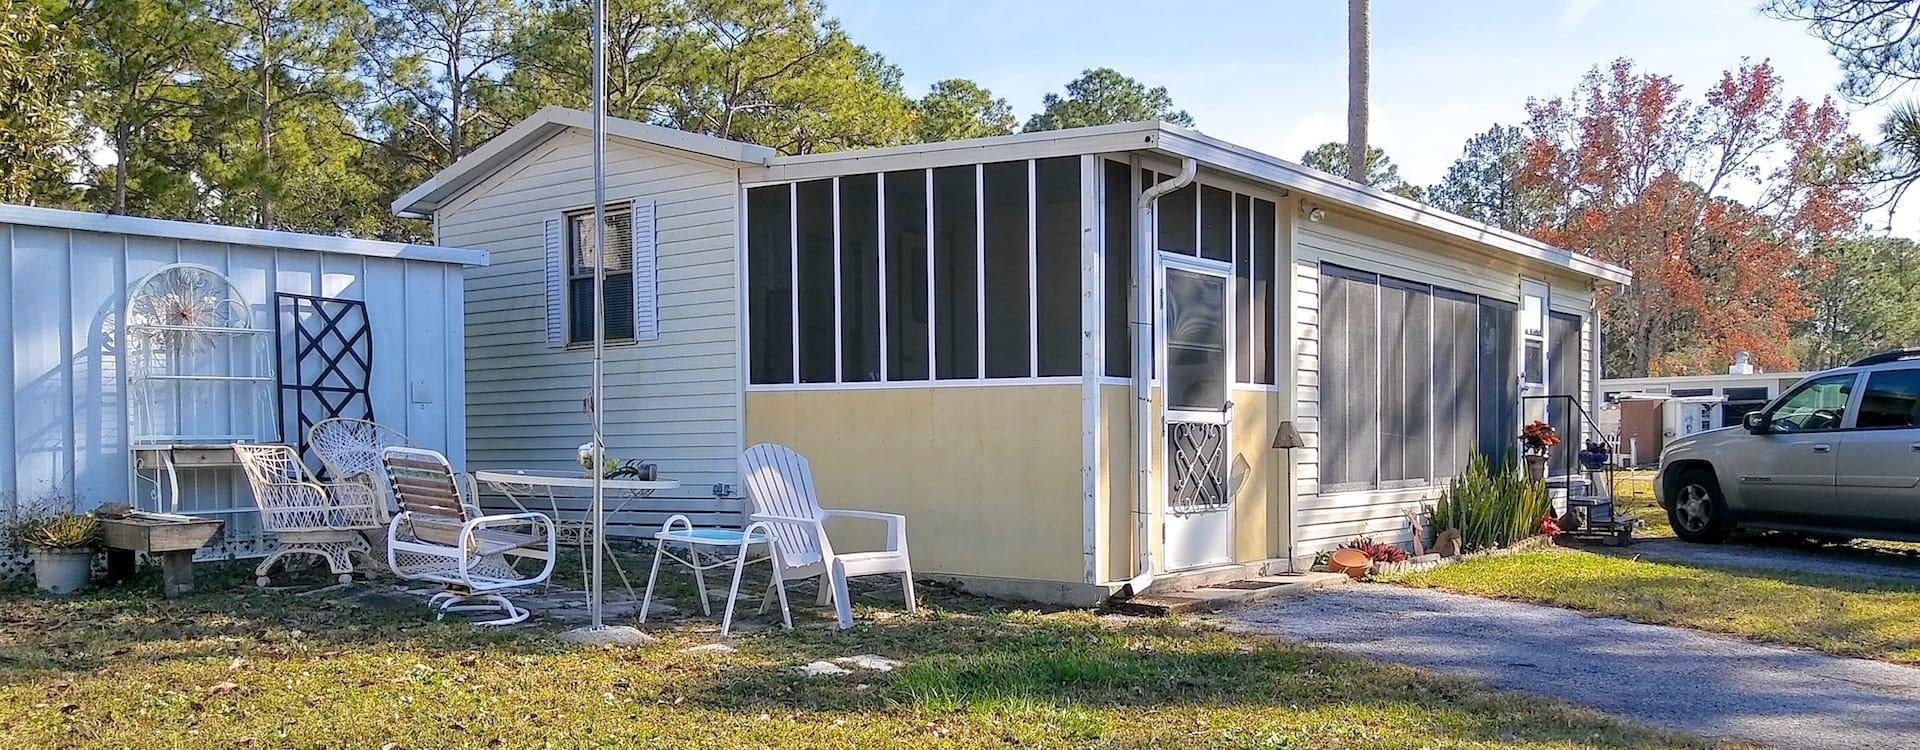 Mobile Home For Sale Port Richey Fl Oak Springs Rv